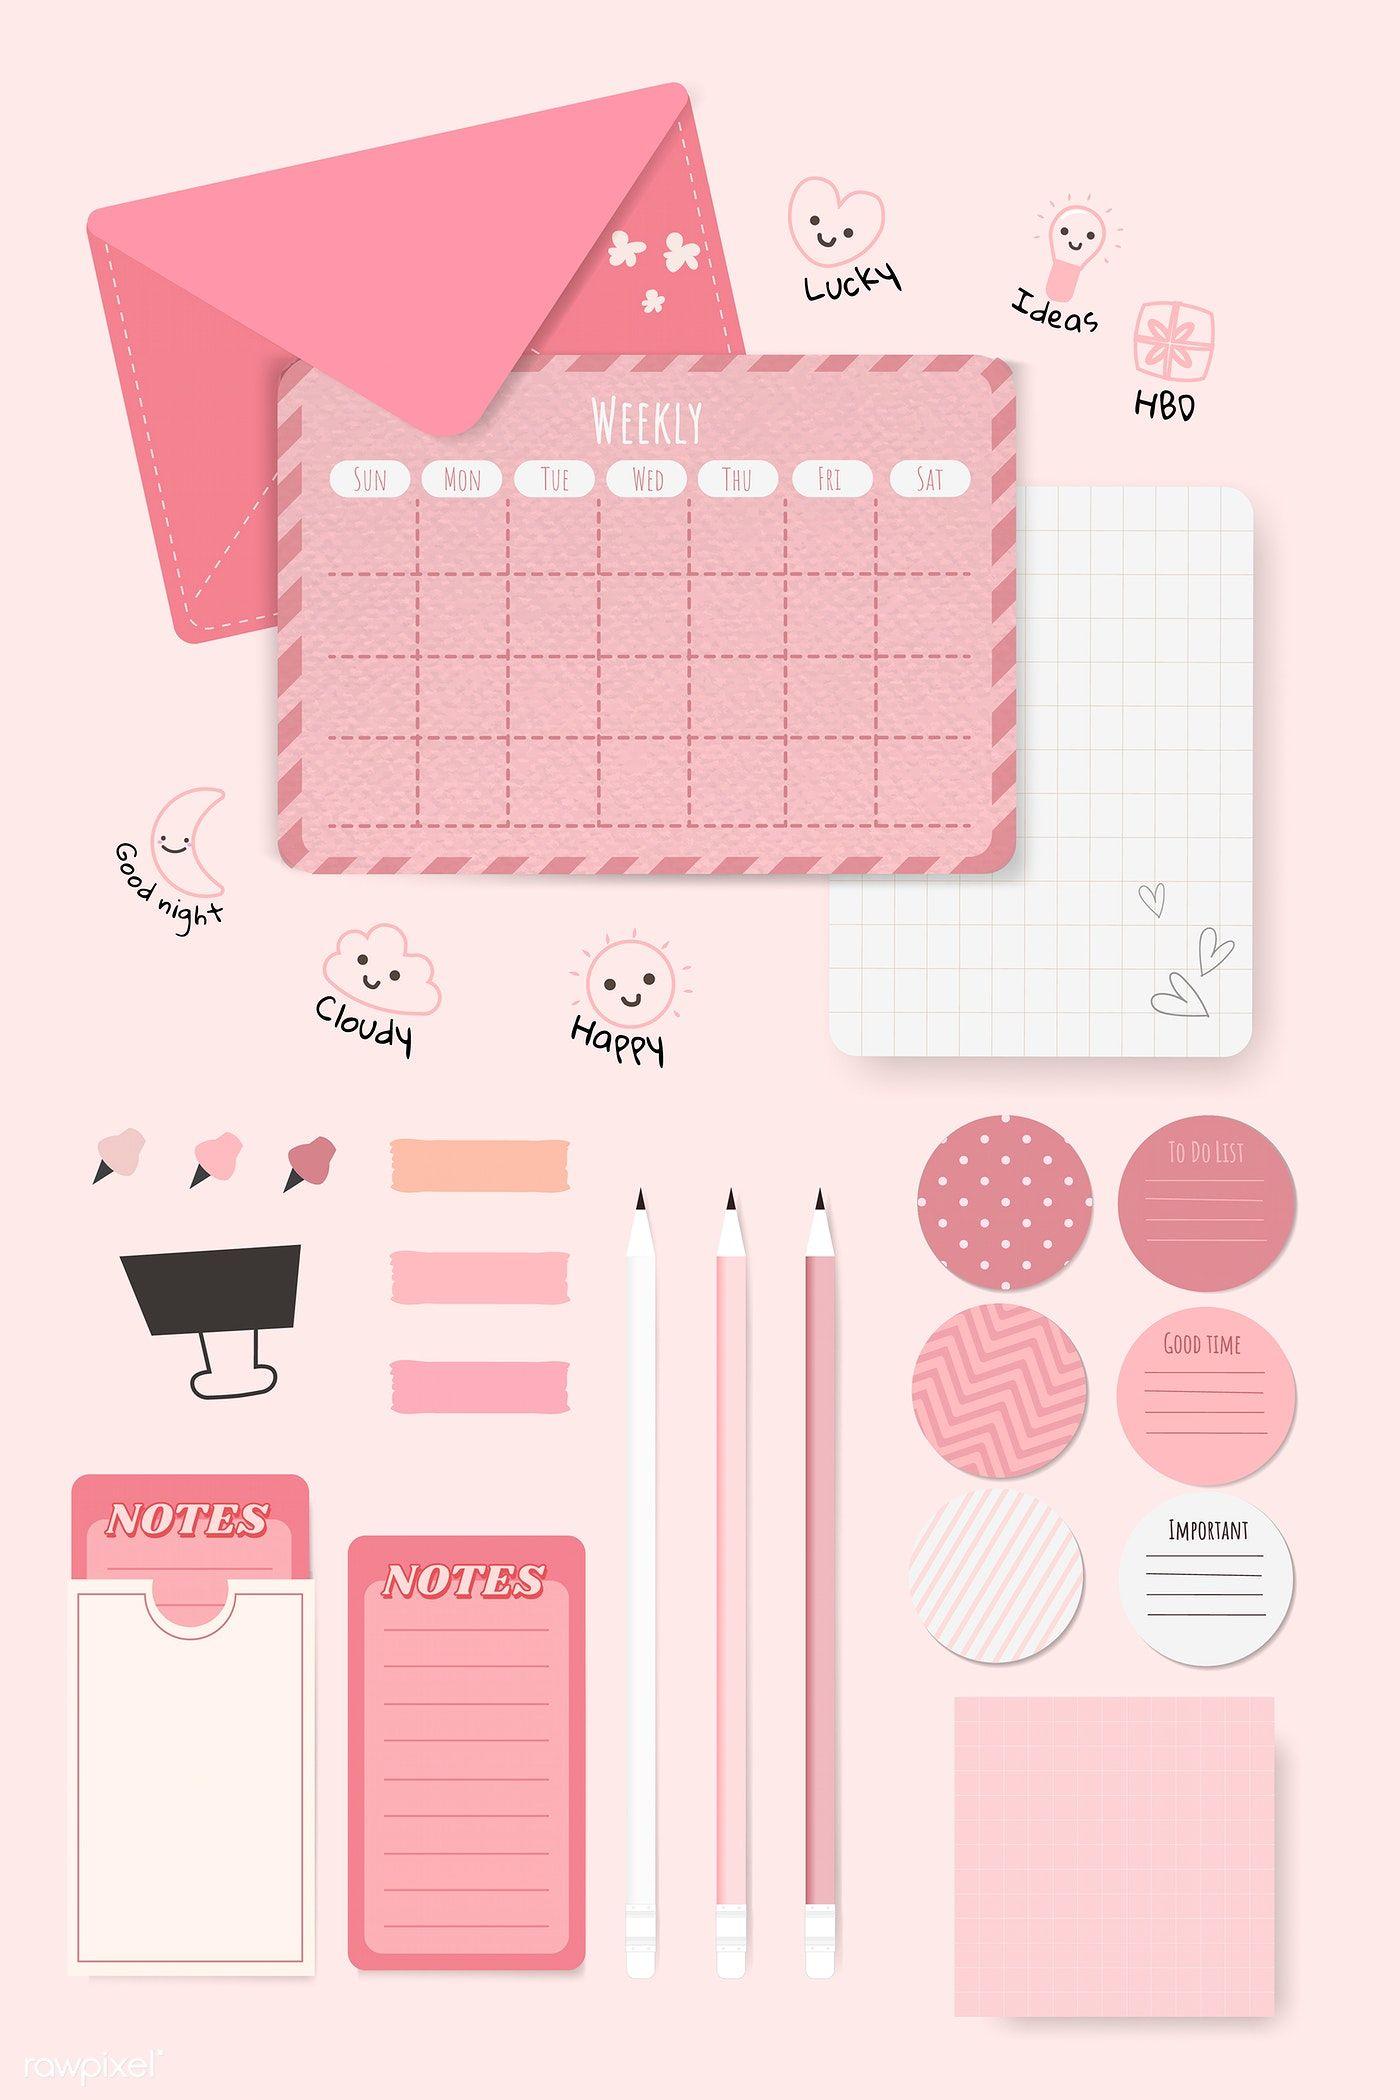 Download Premium Vector Of Pink Stationery Planner Set Vector 1209417 Pink Stationery Planner Stationery Planner Set